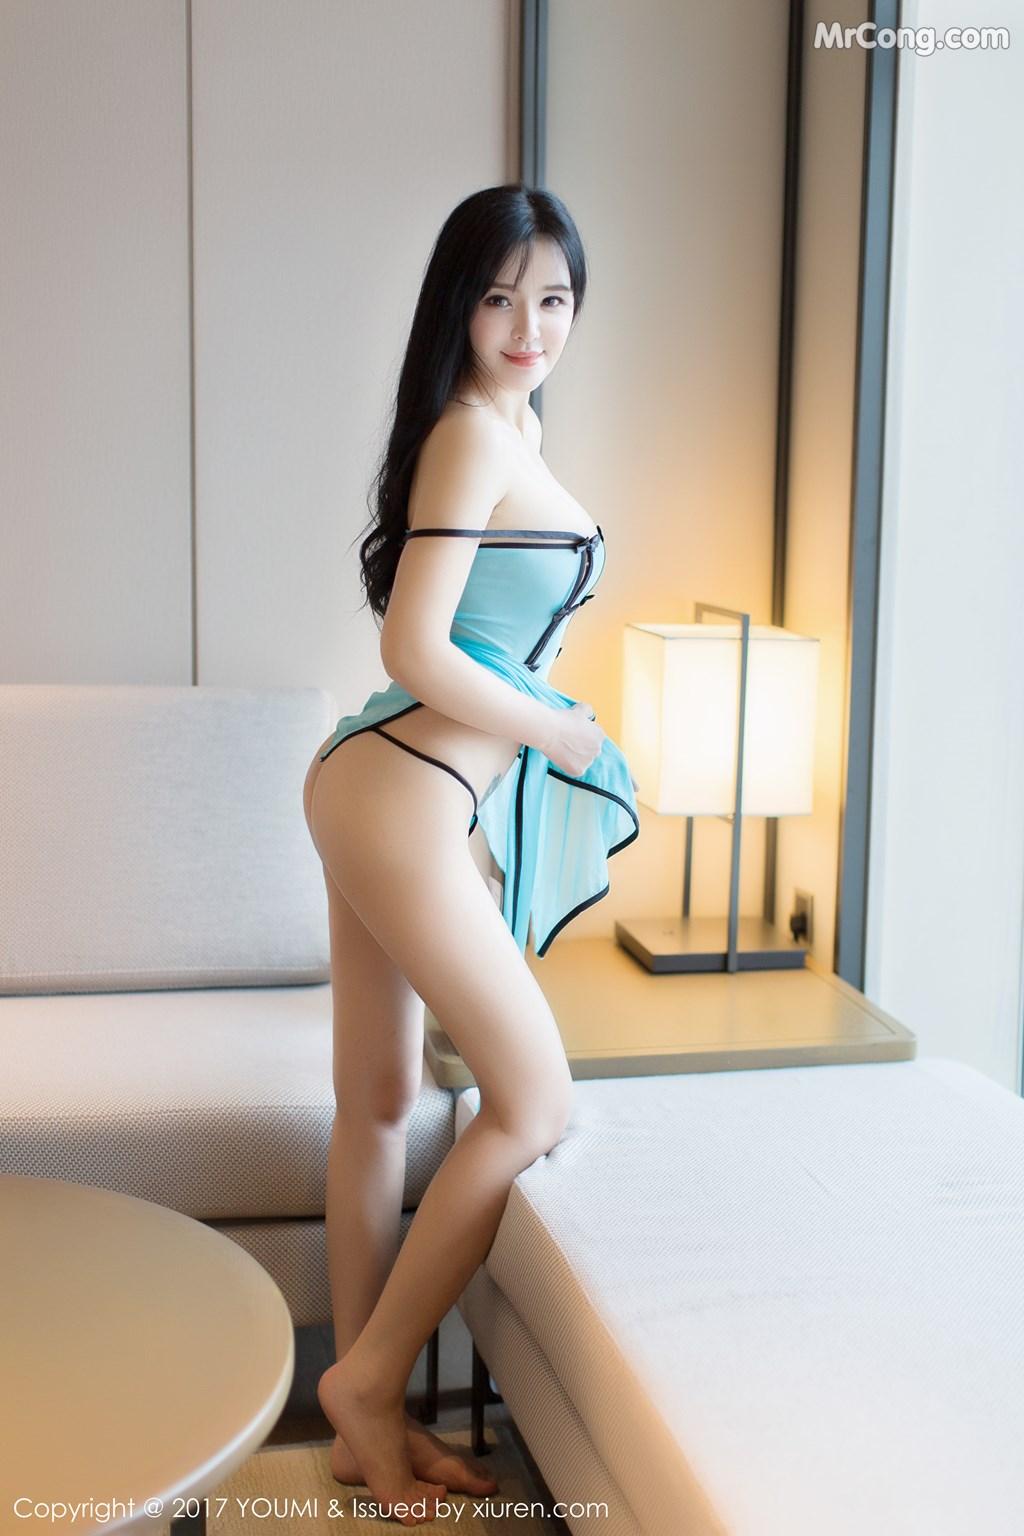 Image YouMi-No.067-Liu-Yu-Er-MrCong.com-034 in post YouMi No.067: Người mẫu Liu Yu Er (刘钰儿) (45 ảnh)